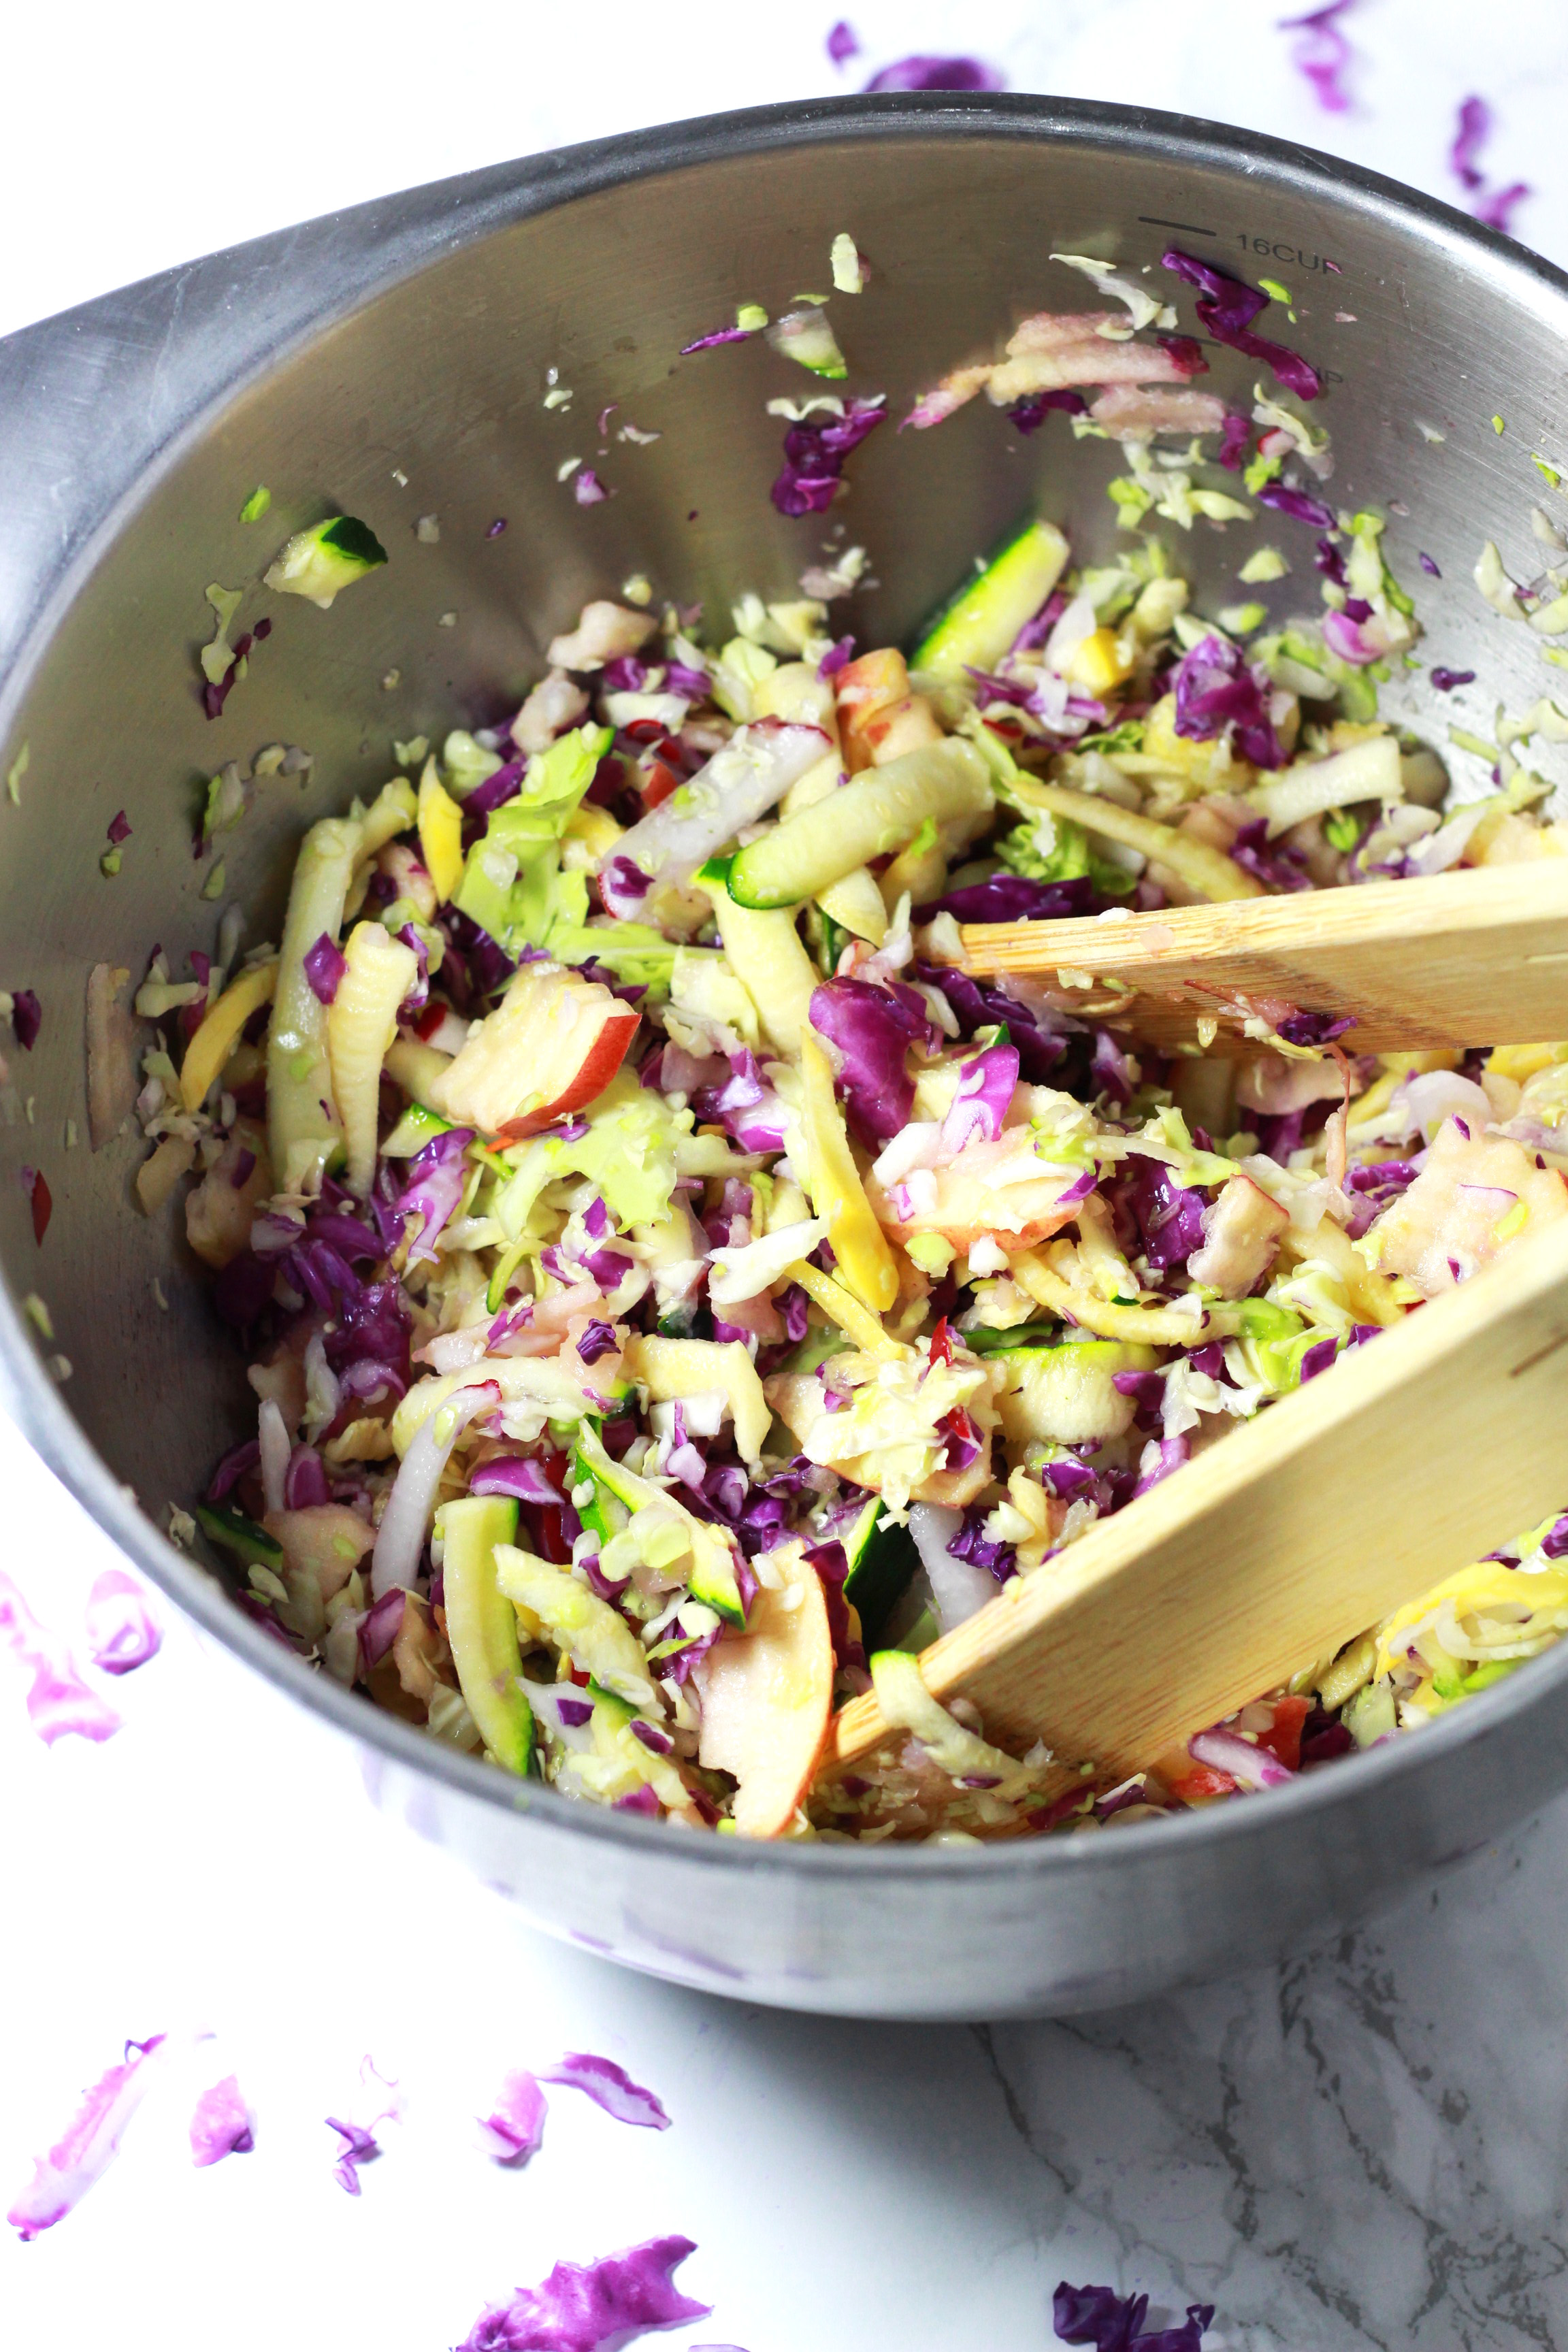 Saladmaster salad maker recipes zucchini